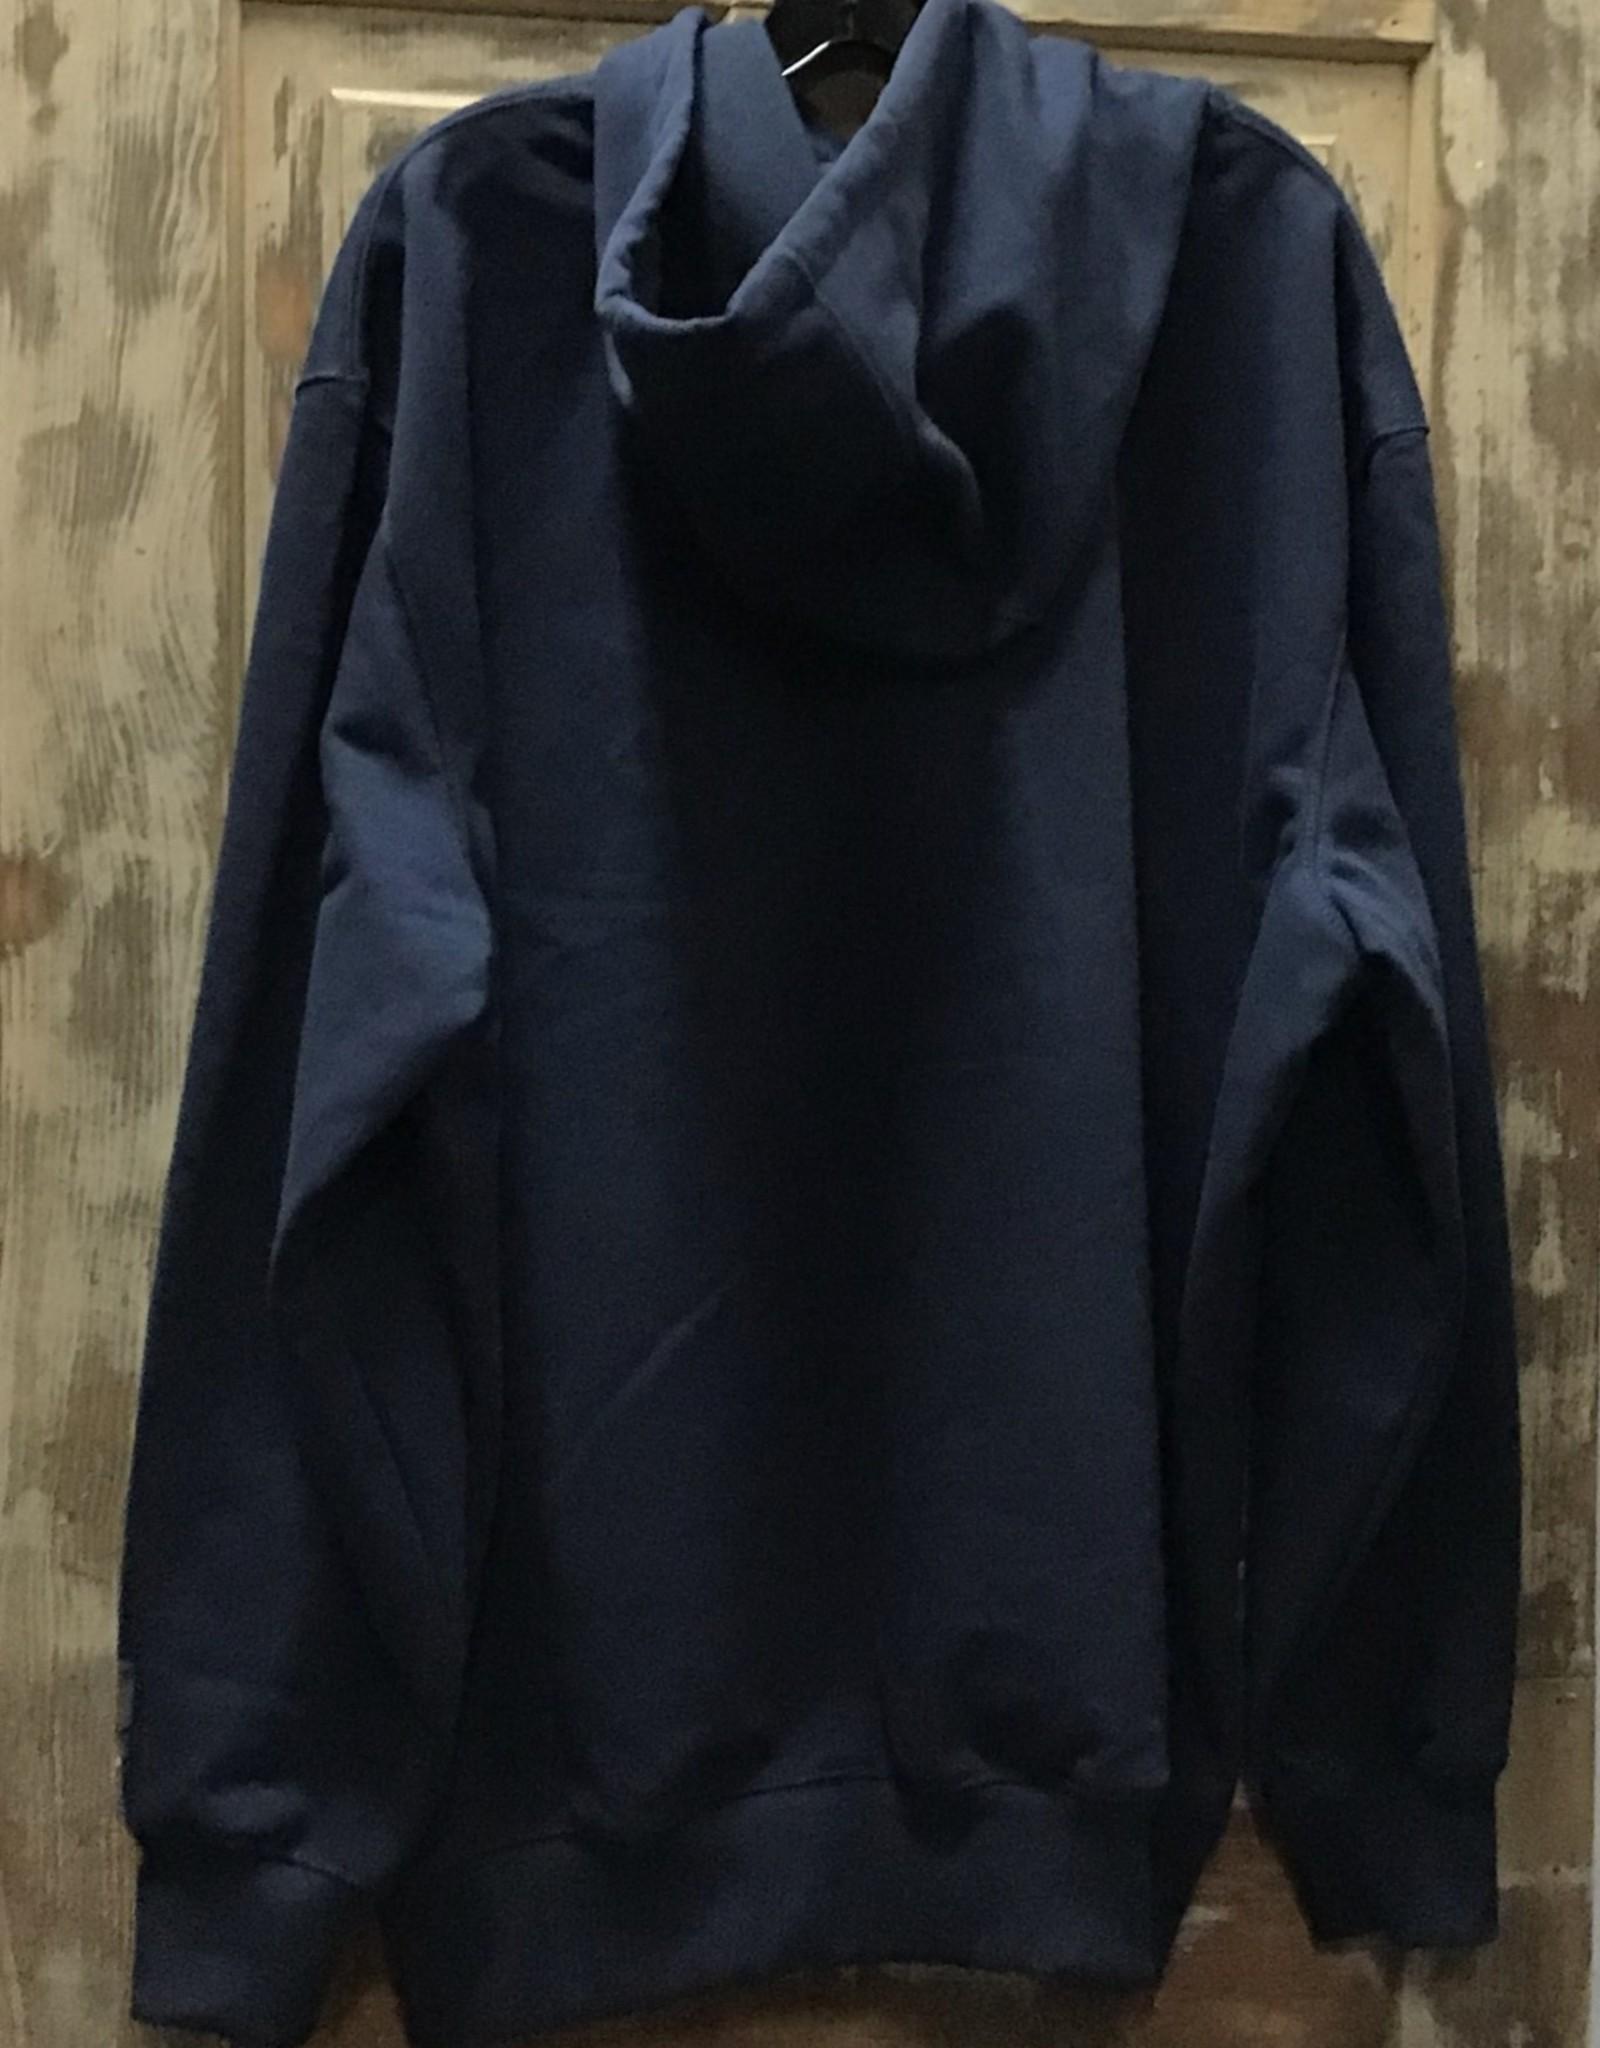 Carhartt Carhartt 100615 Rain Defender Paxton Heavyweight Hooded Sweatshirt Men's